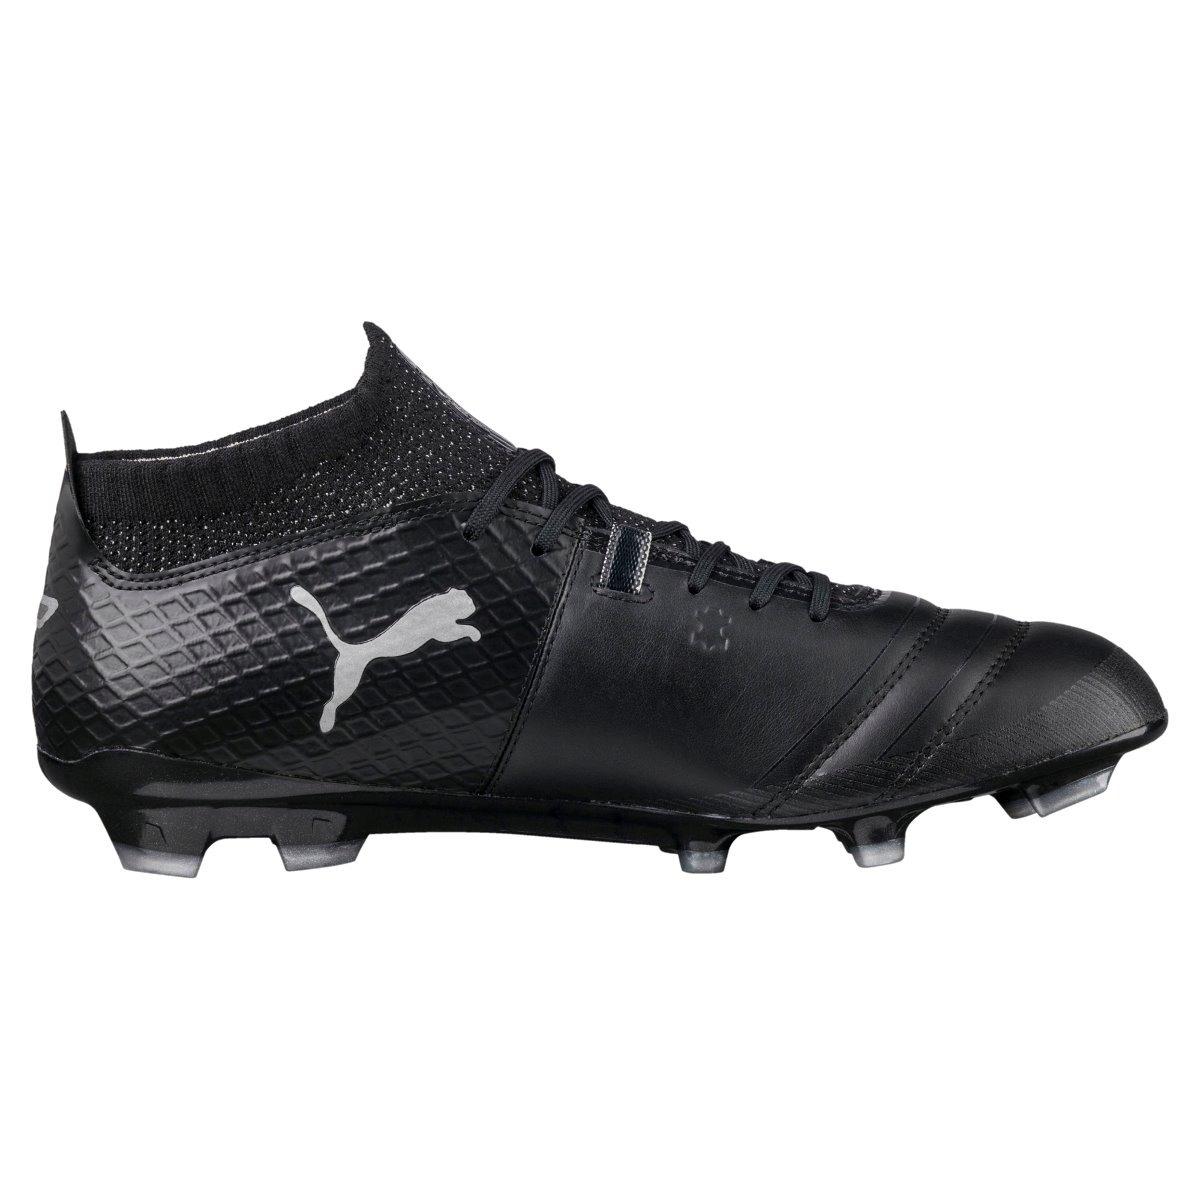 De Libre 00 U s Zapatos 17 En Futbol Mercado 1 Fg One Puma 348 dxR4Oq